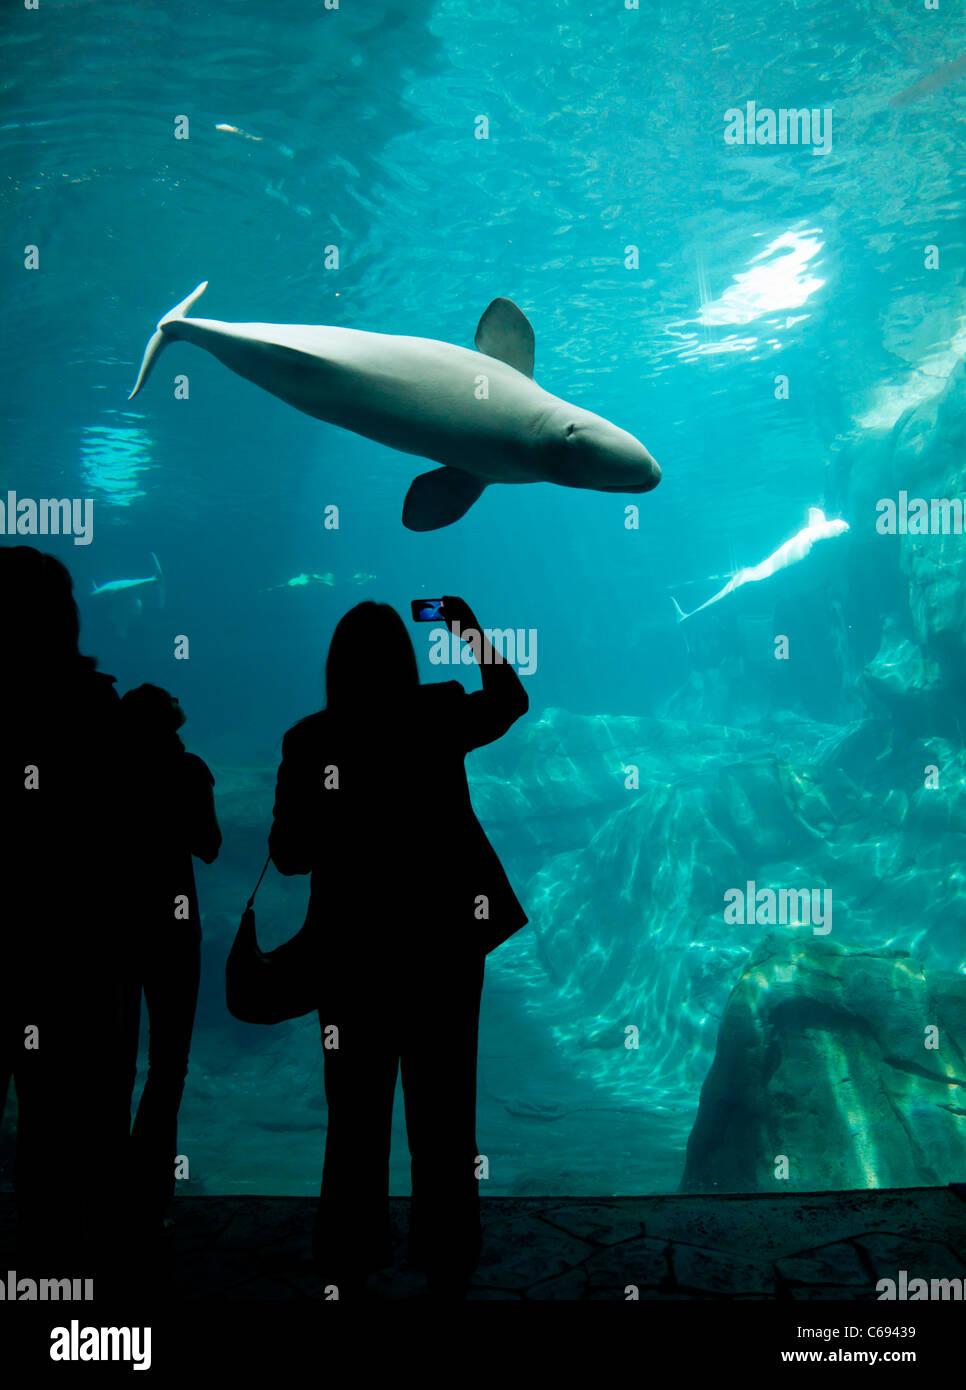 Visitors at an aquarium - Stock Image